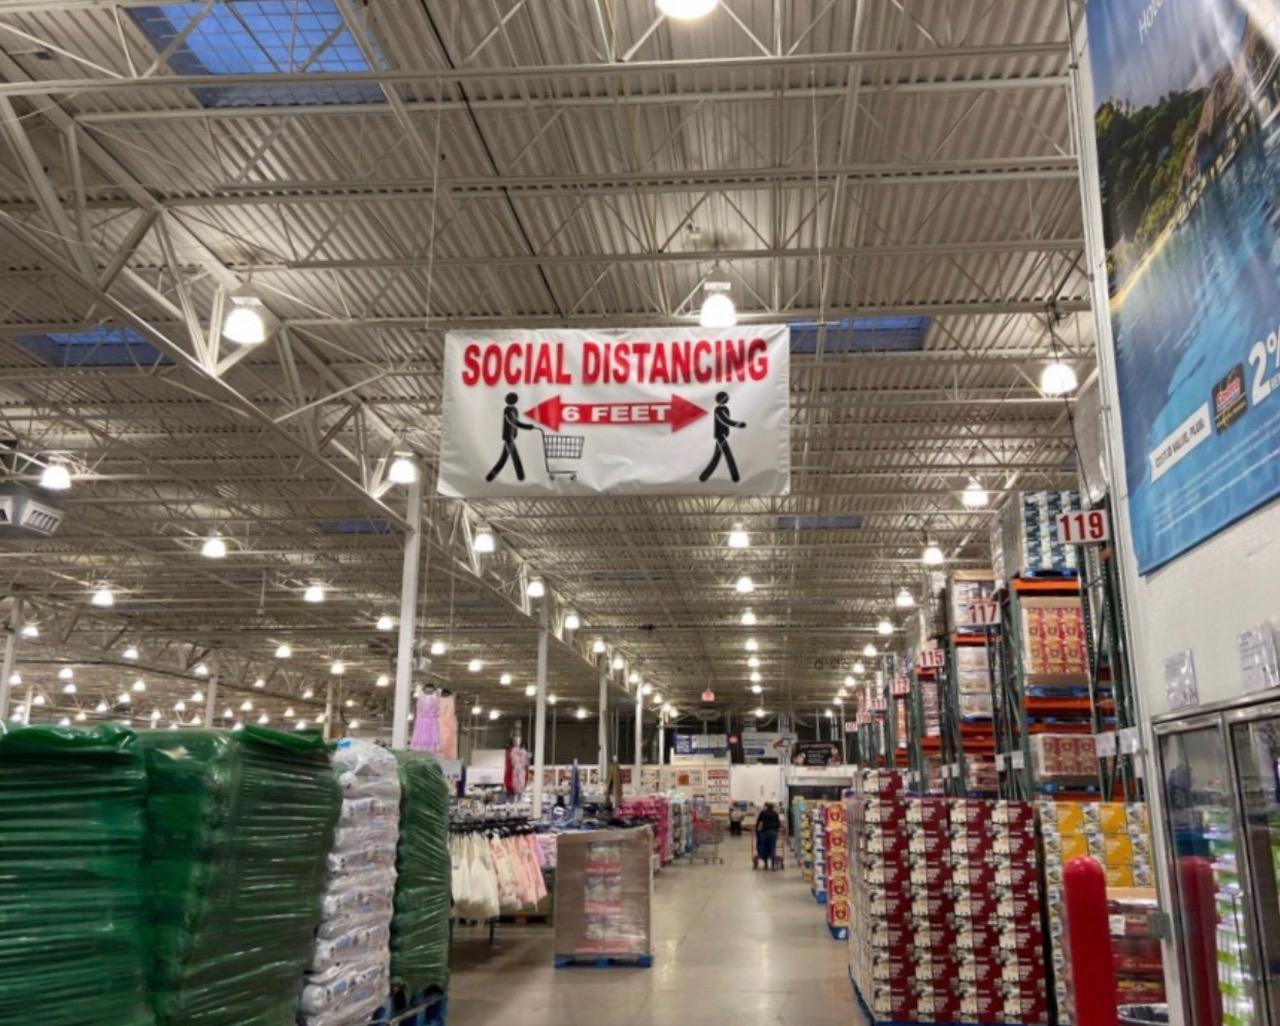 Costco encourages keeping six feet away.